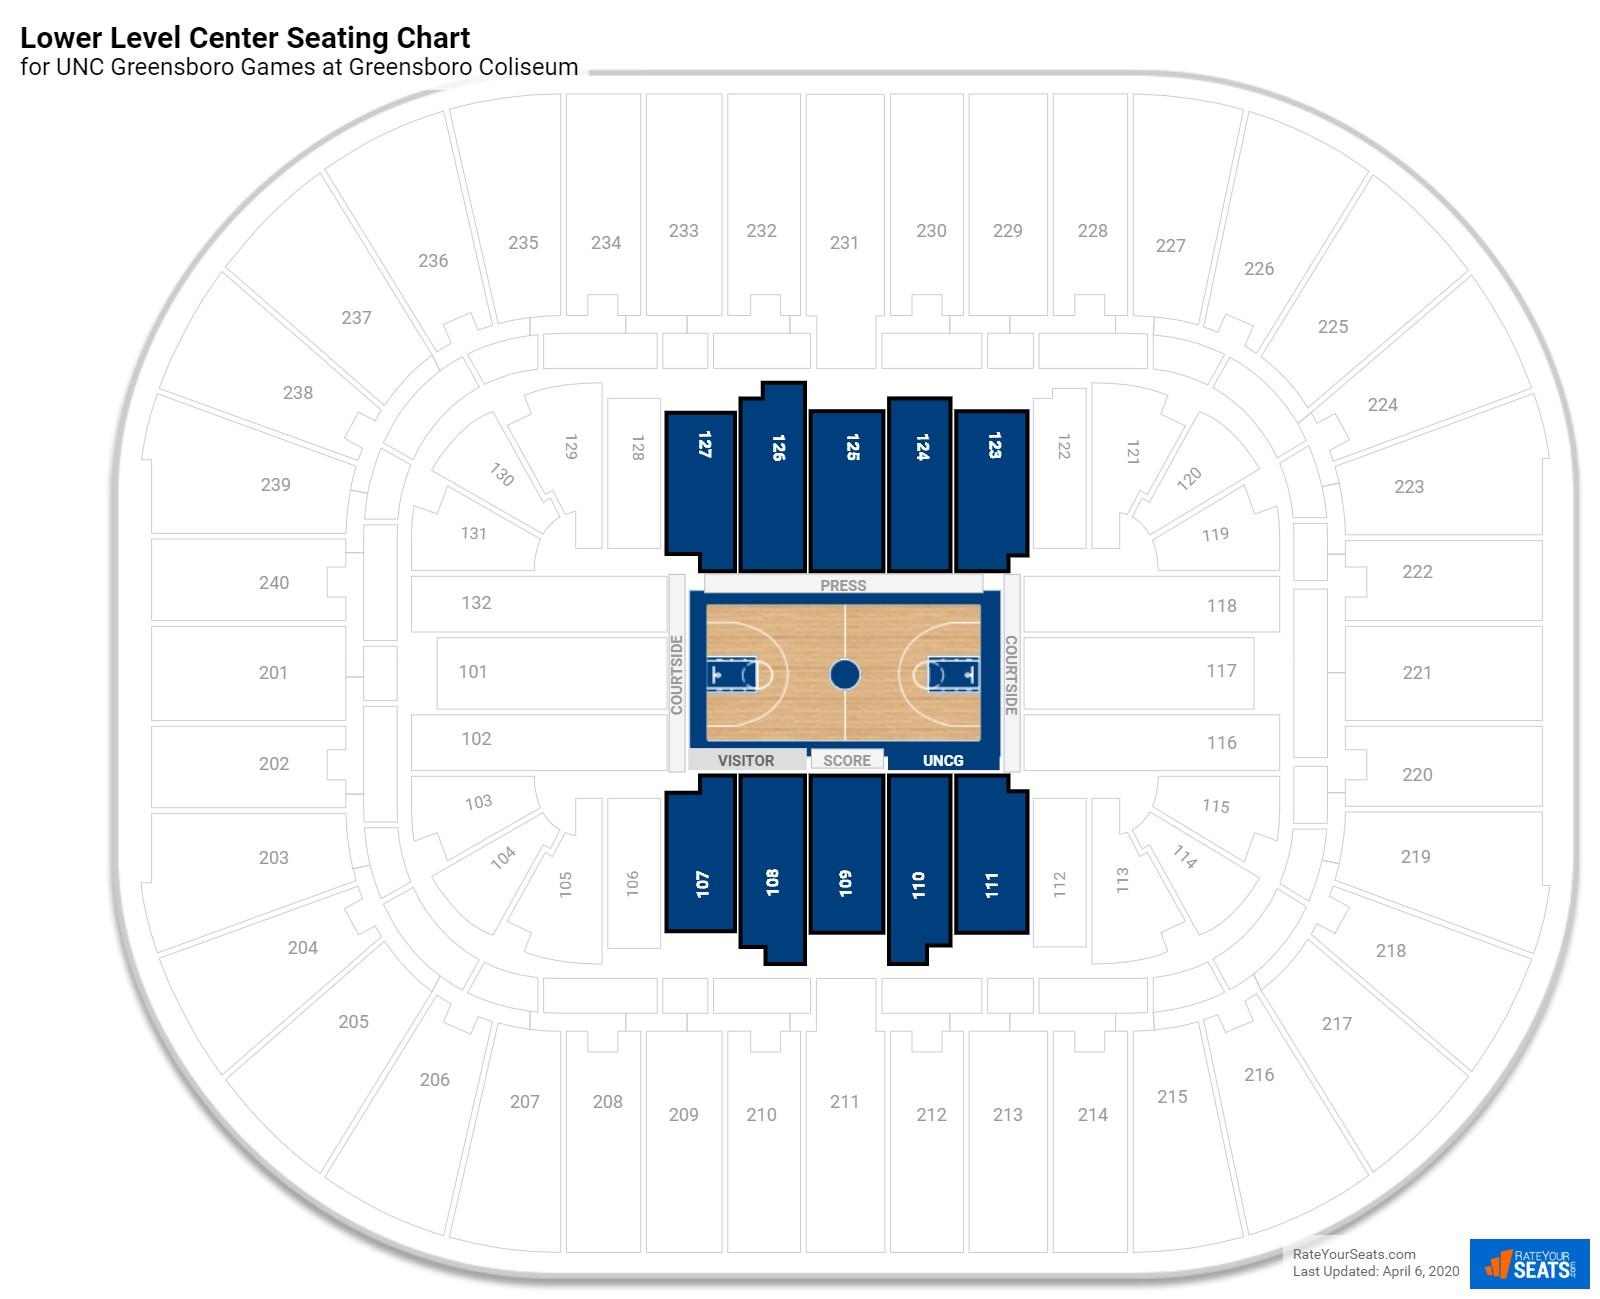 Greensboro Coliseum Lower Level Center Seating Chart